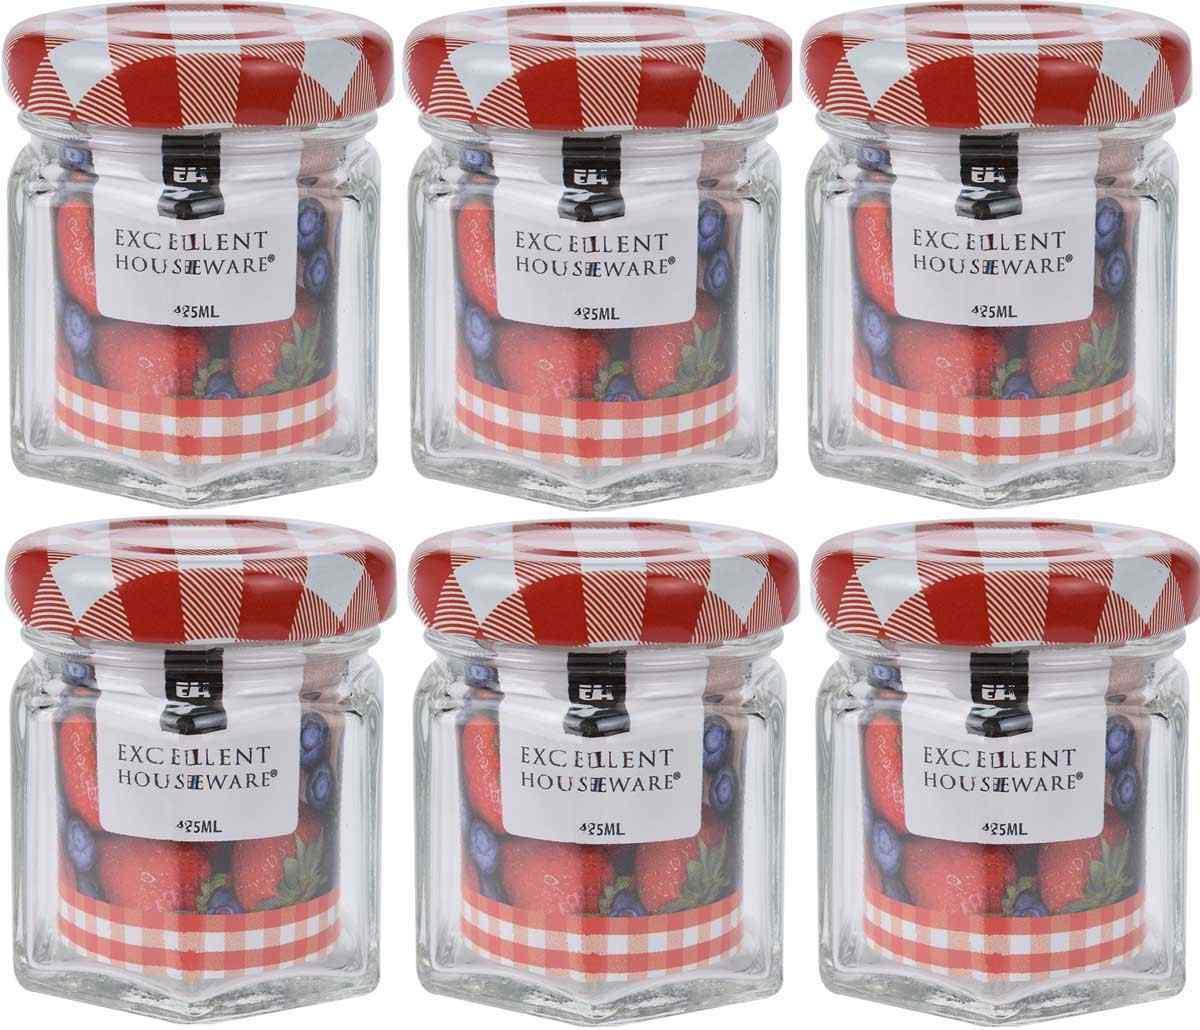 Set of Glass 45ml Spice Herb Jam Preserve Glass Storage ...